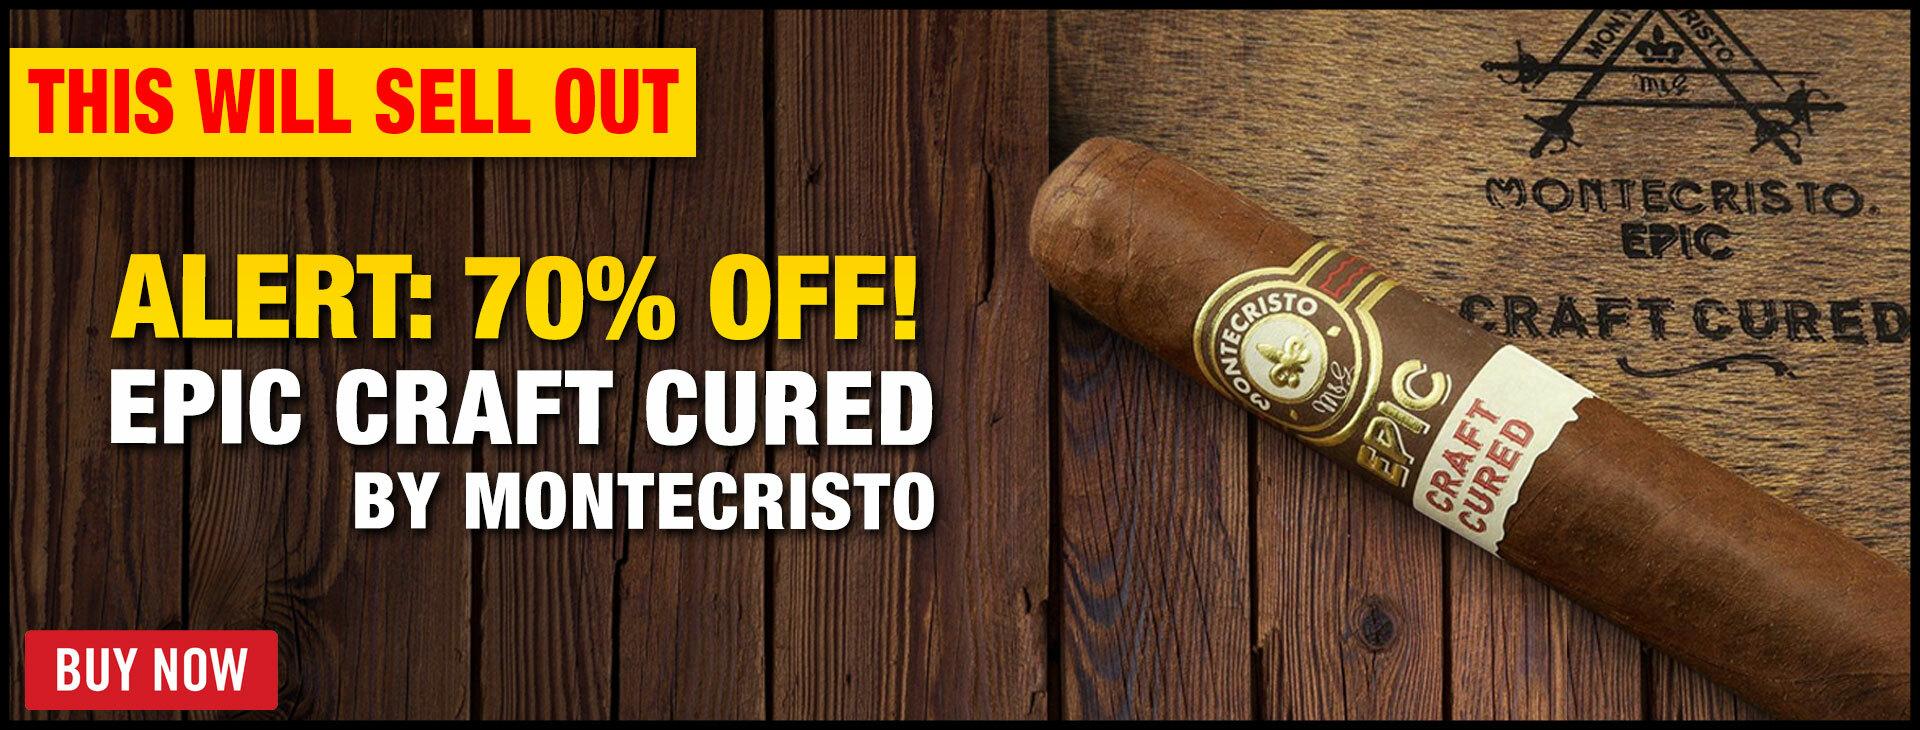 70% OFF MONTECRISTO EPIC CRAFT CURED